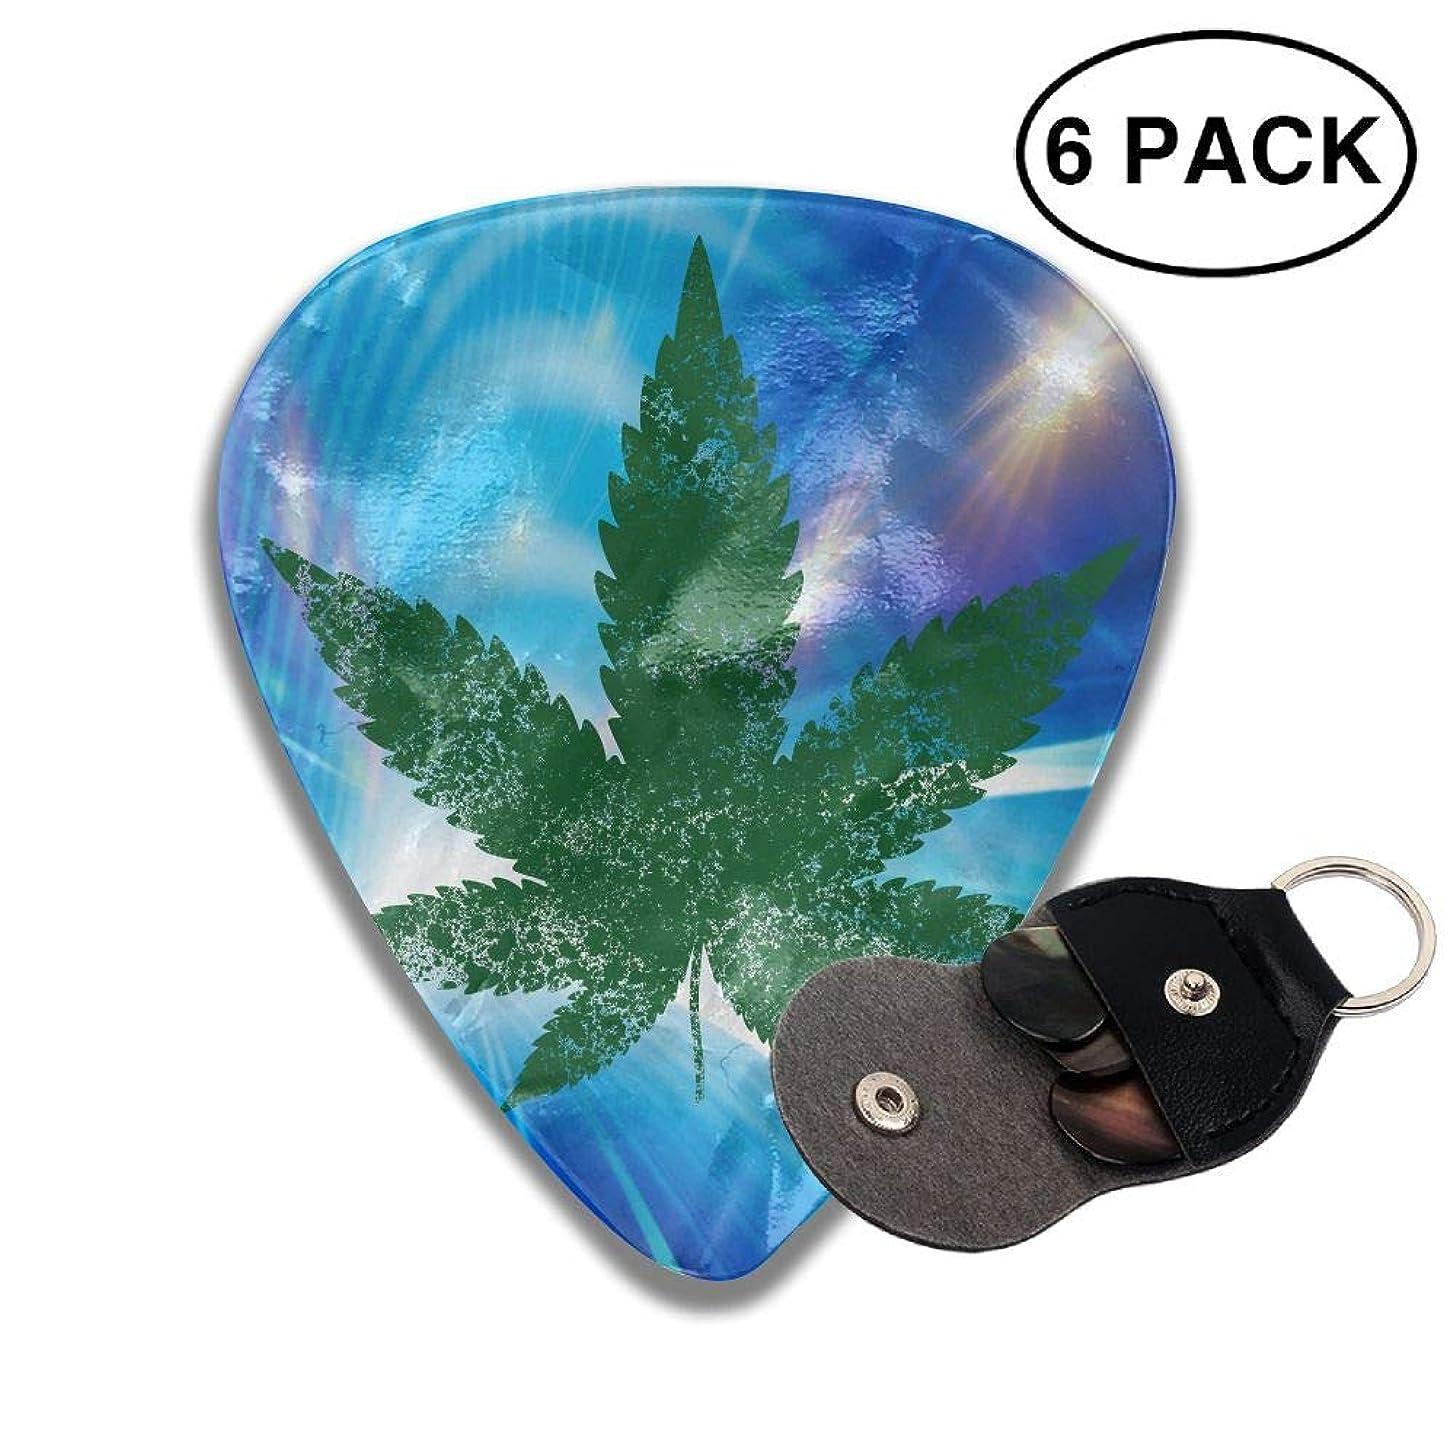 CUTEDWARF 6 Pieces of Personalized Guitar Picks Cannabis Leaf Print